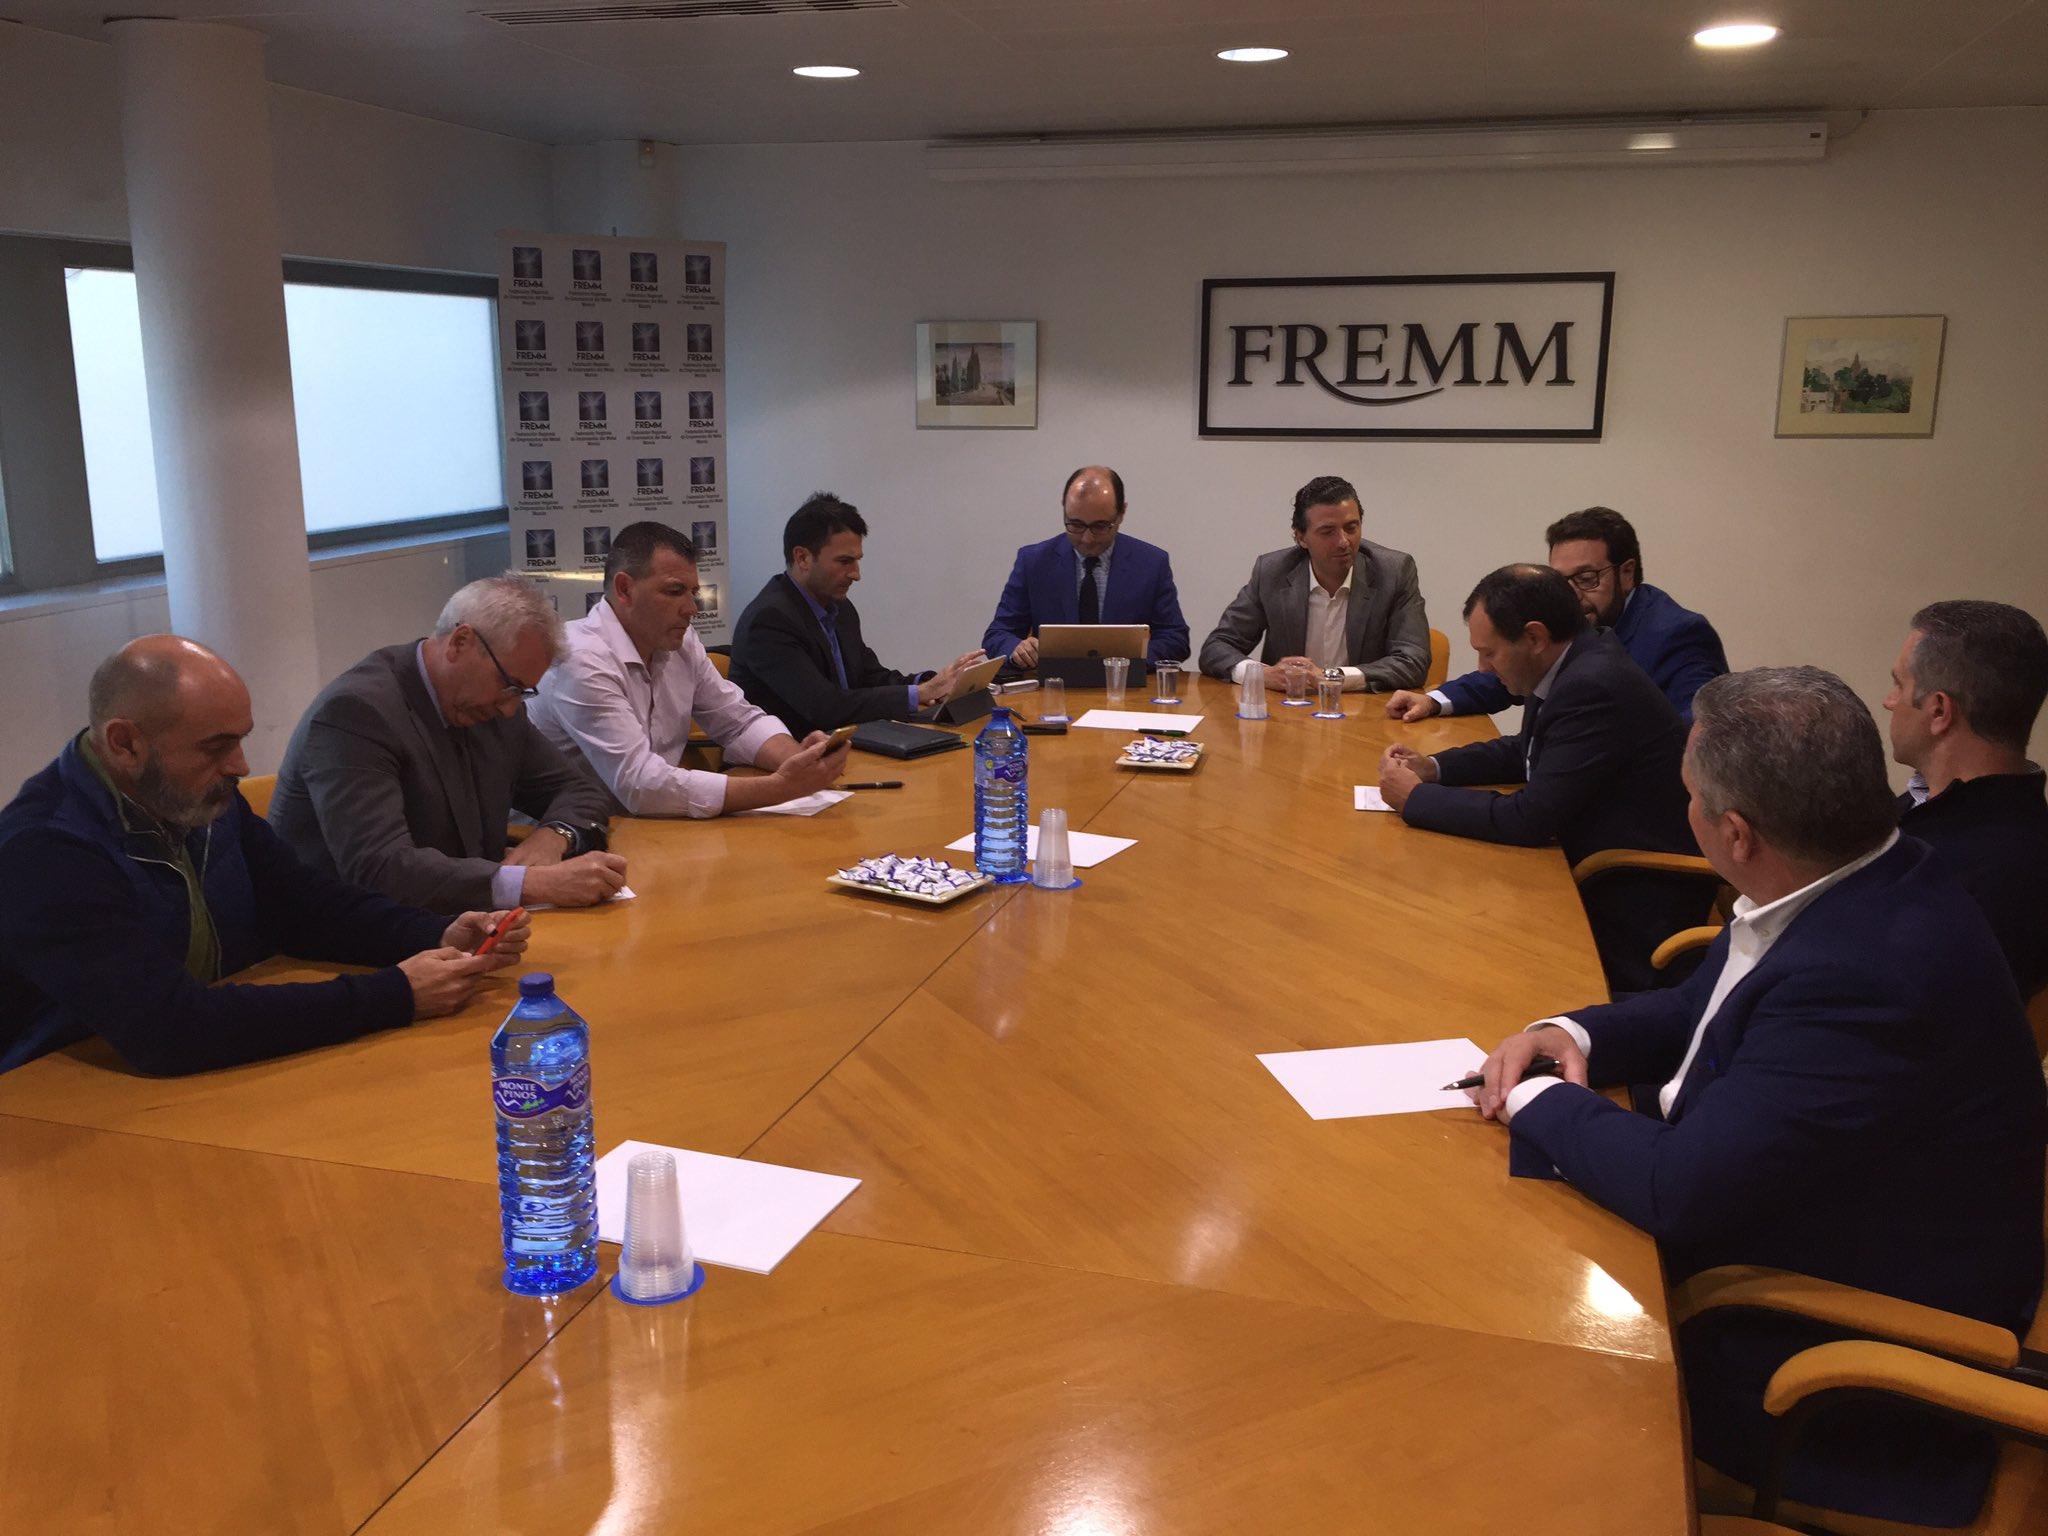 FREMM e Instituto de Fomento unen esfuerzos en favor de la Industria 4.0